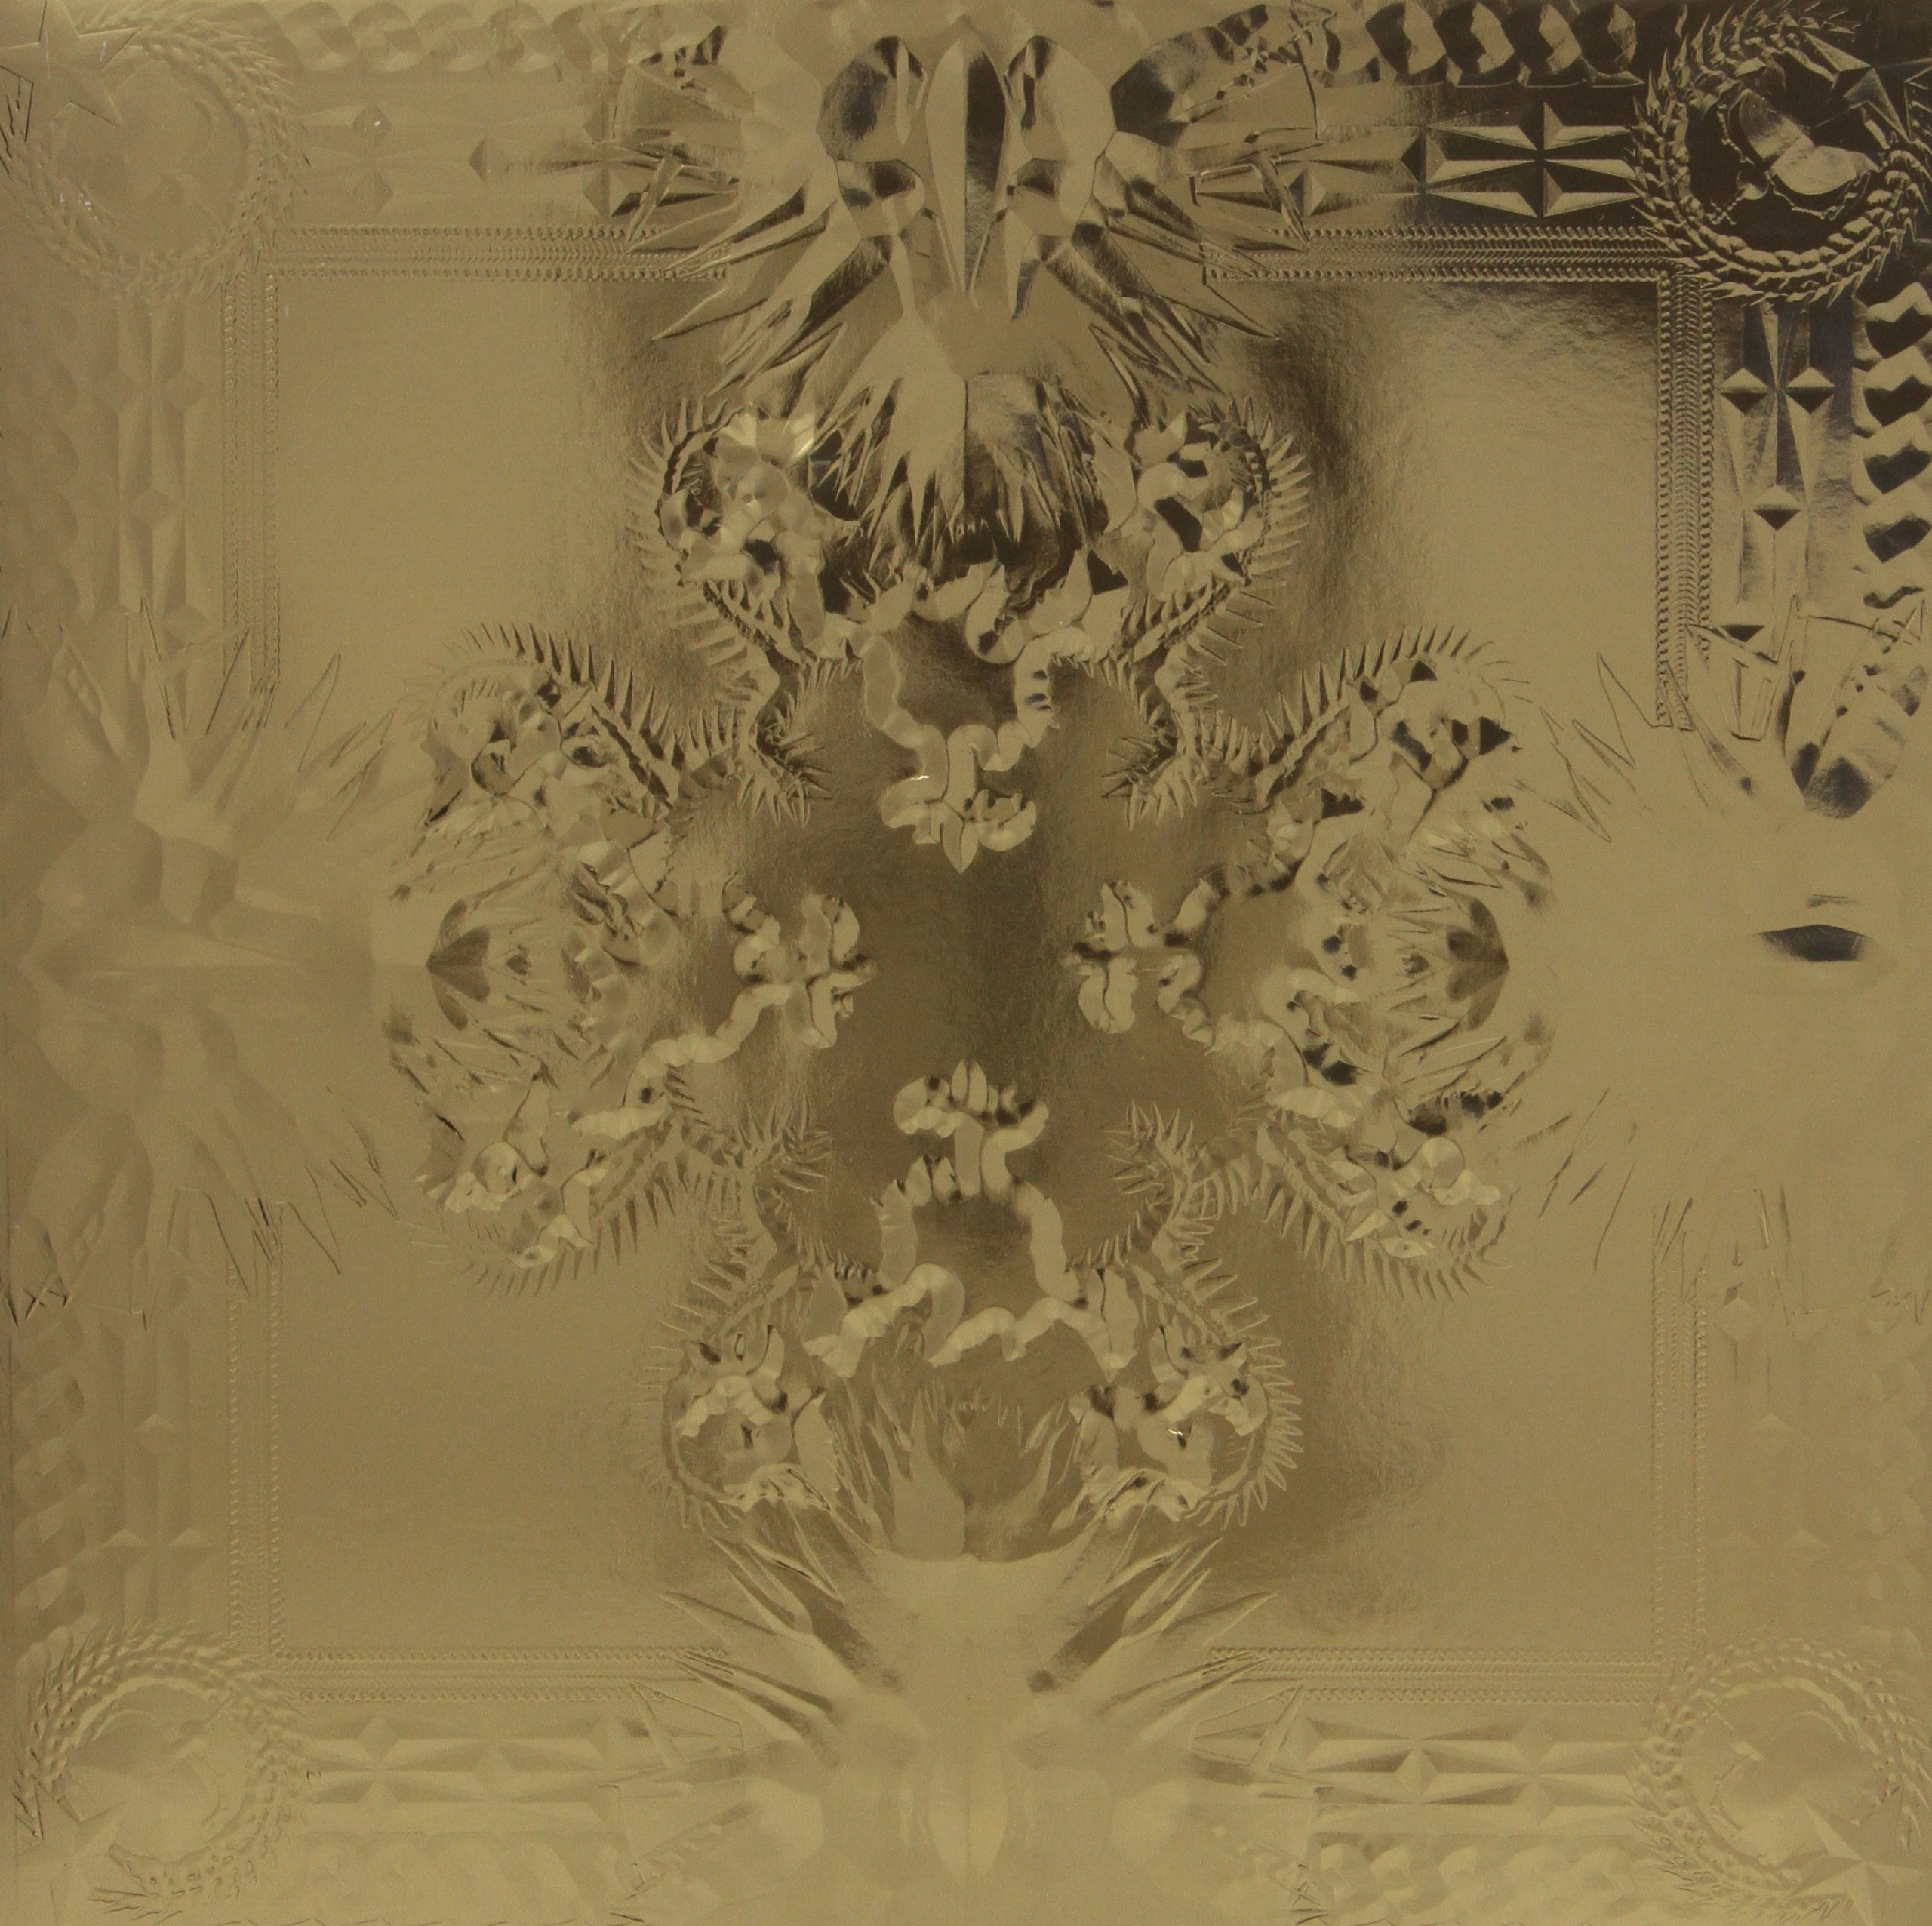 Watch The Throne [2 LP][Explicit] by VINYL